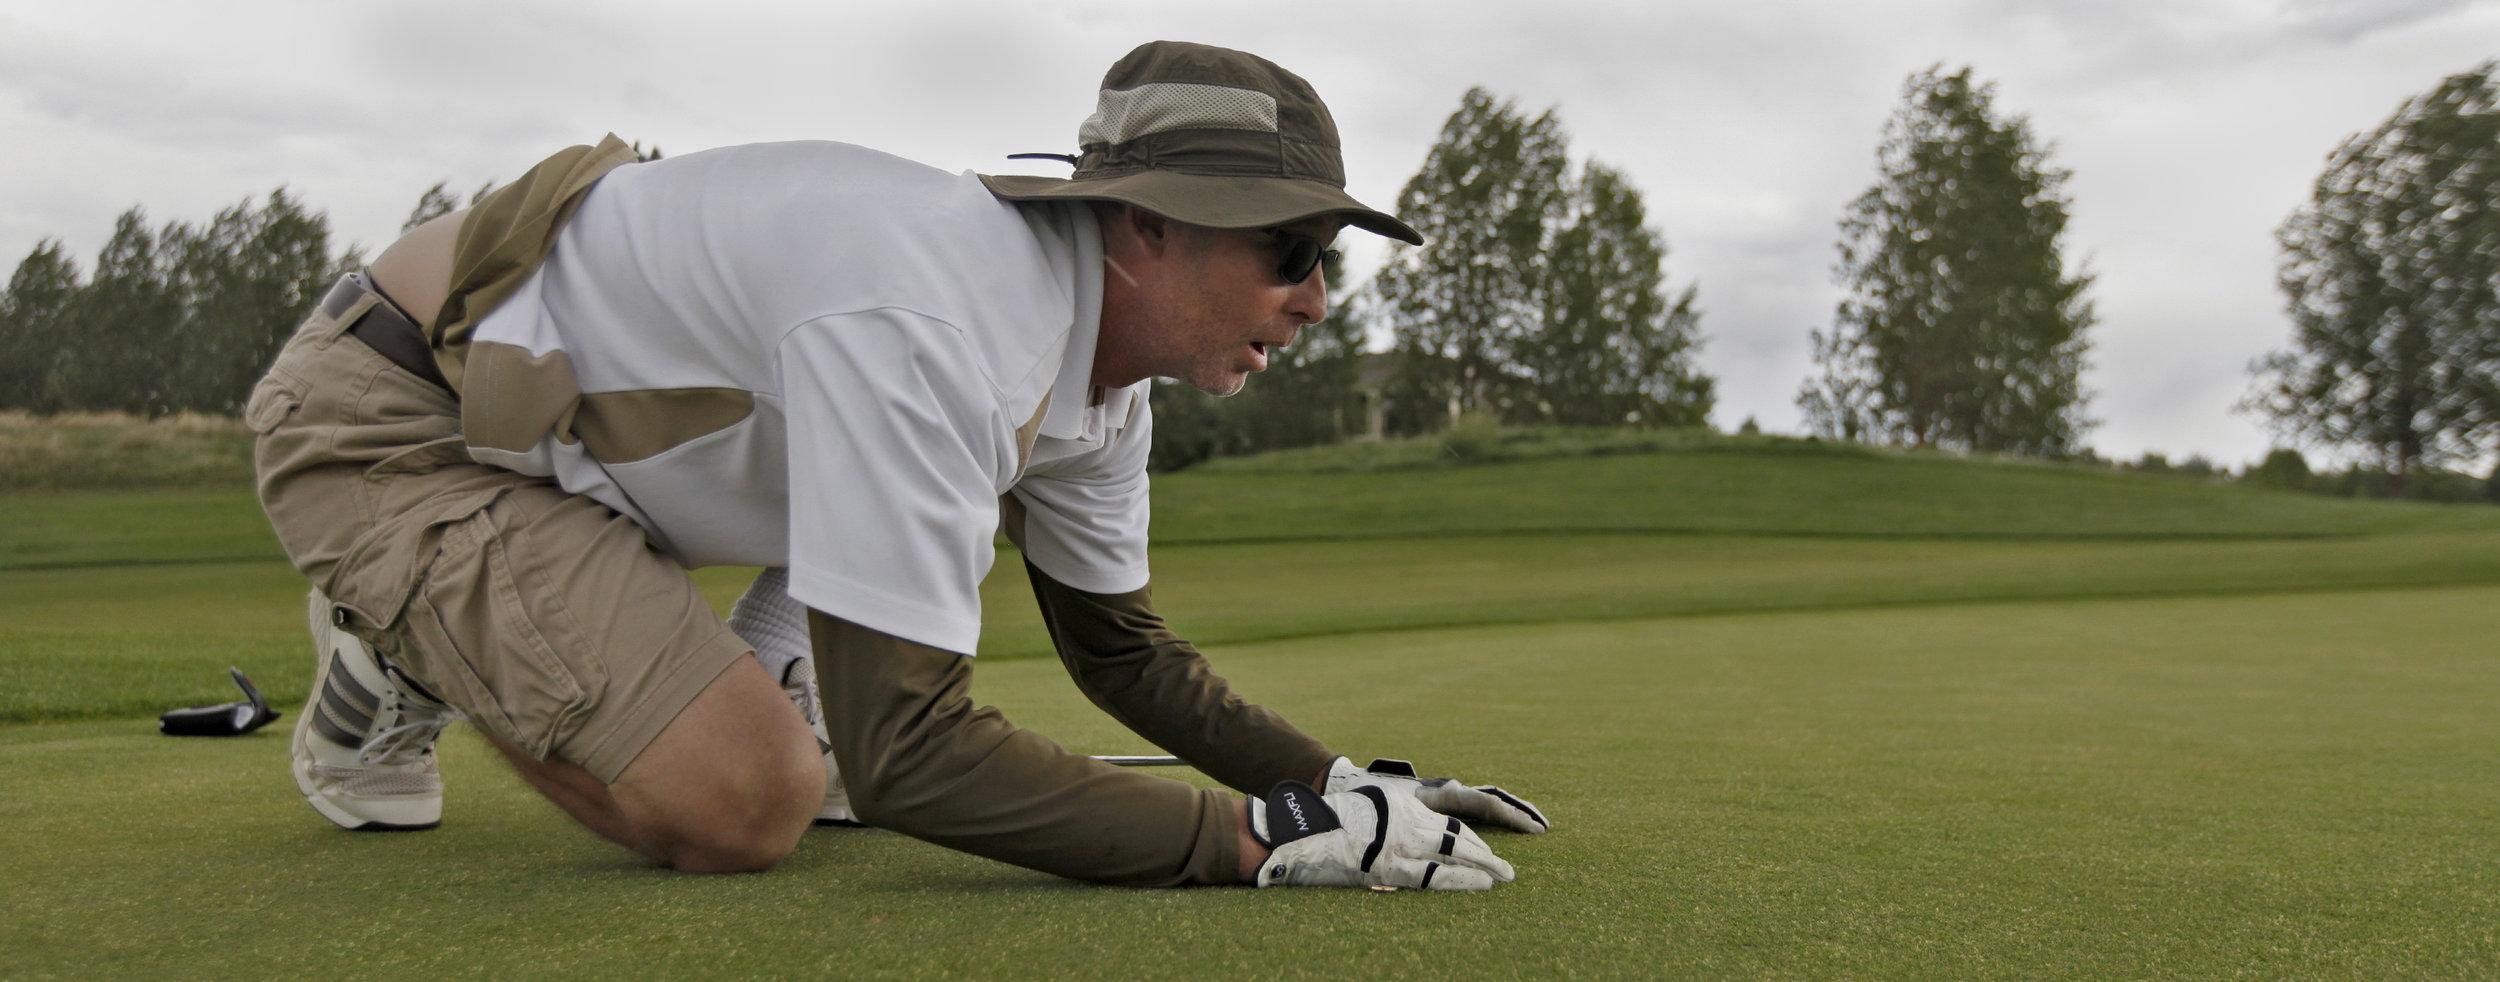 2014_Logan_Golf_Tournament_0054.jpg